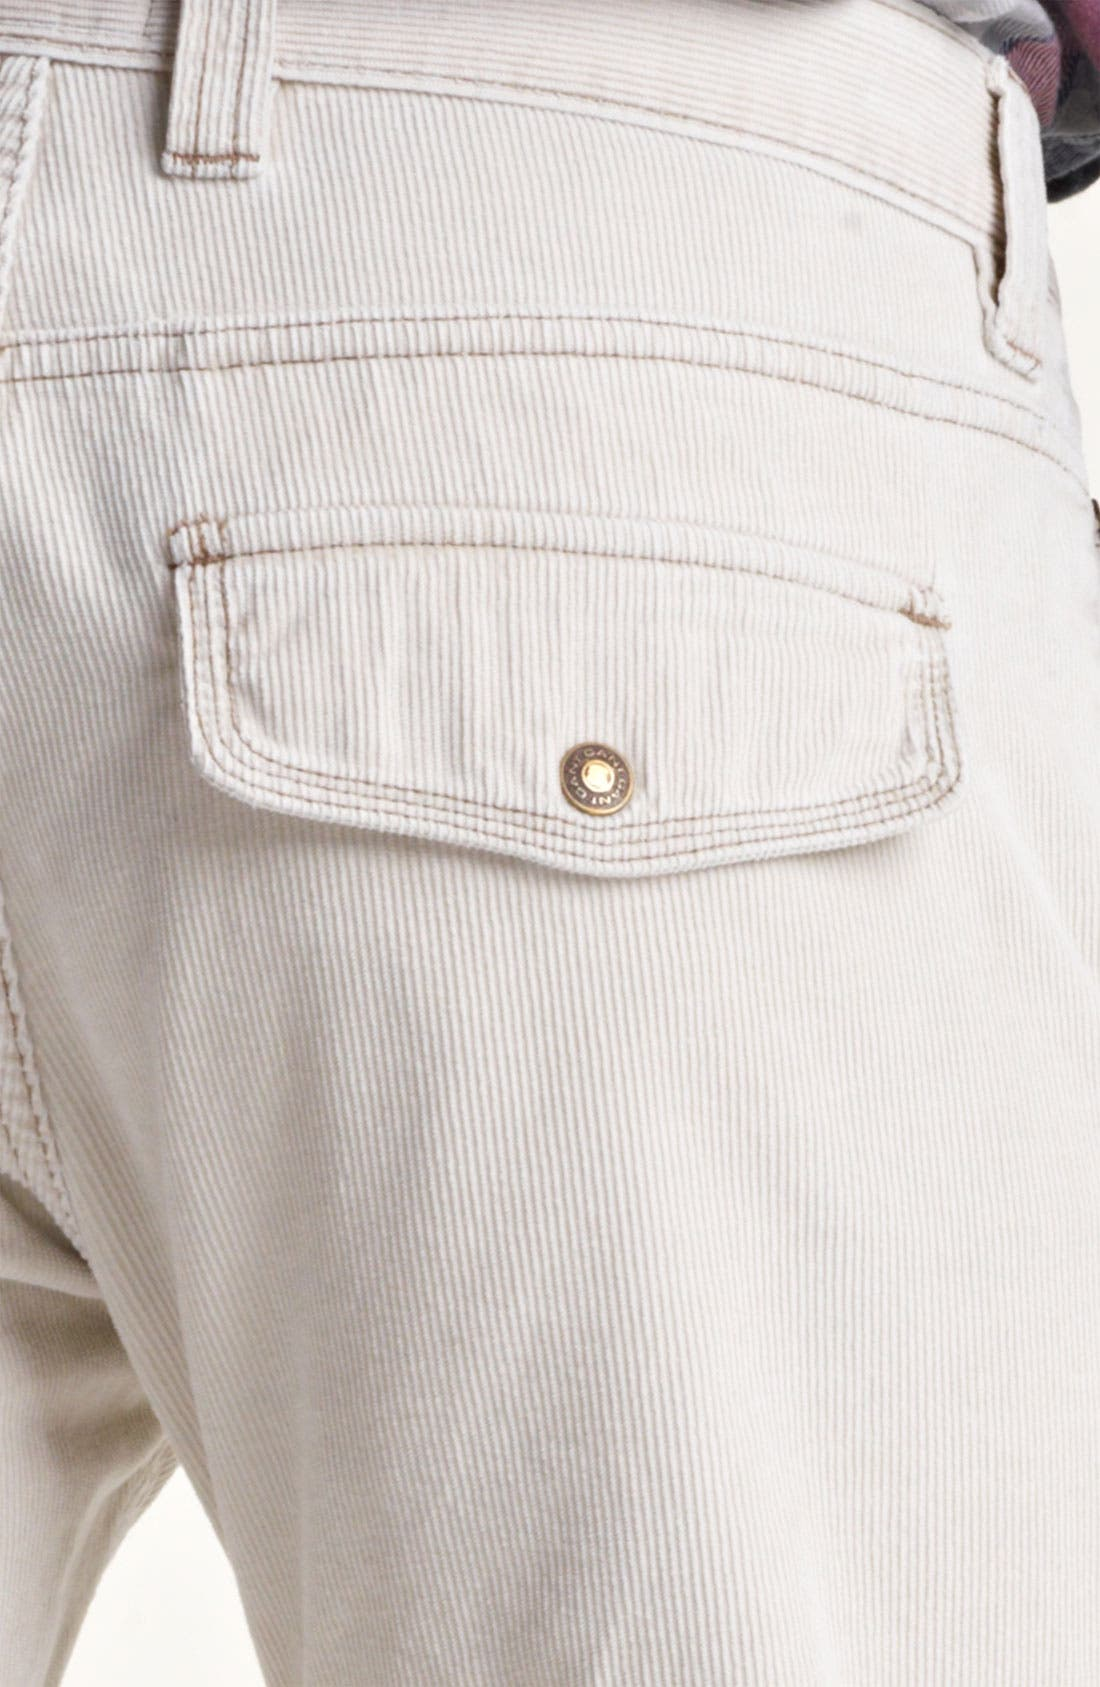 'Explorer' Slim Leg Corduroy Pants,                             Alternate thumbnail 2, color,                             034